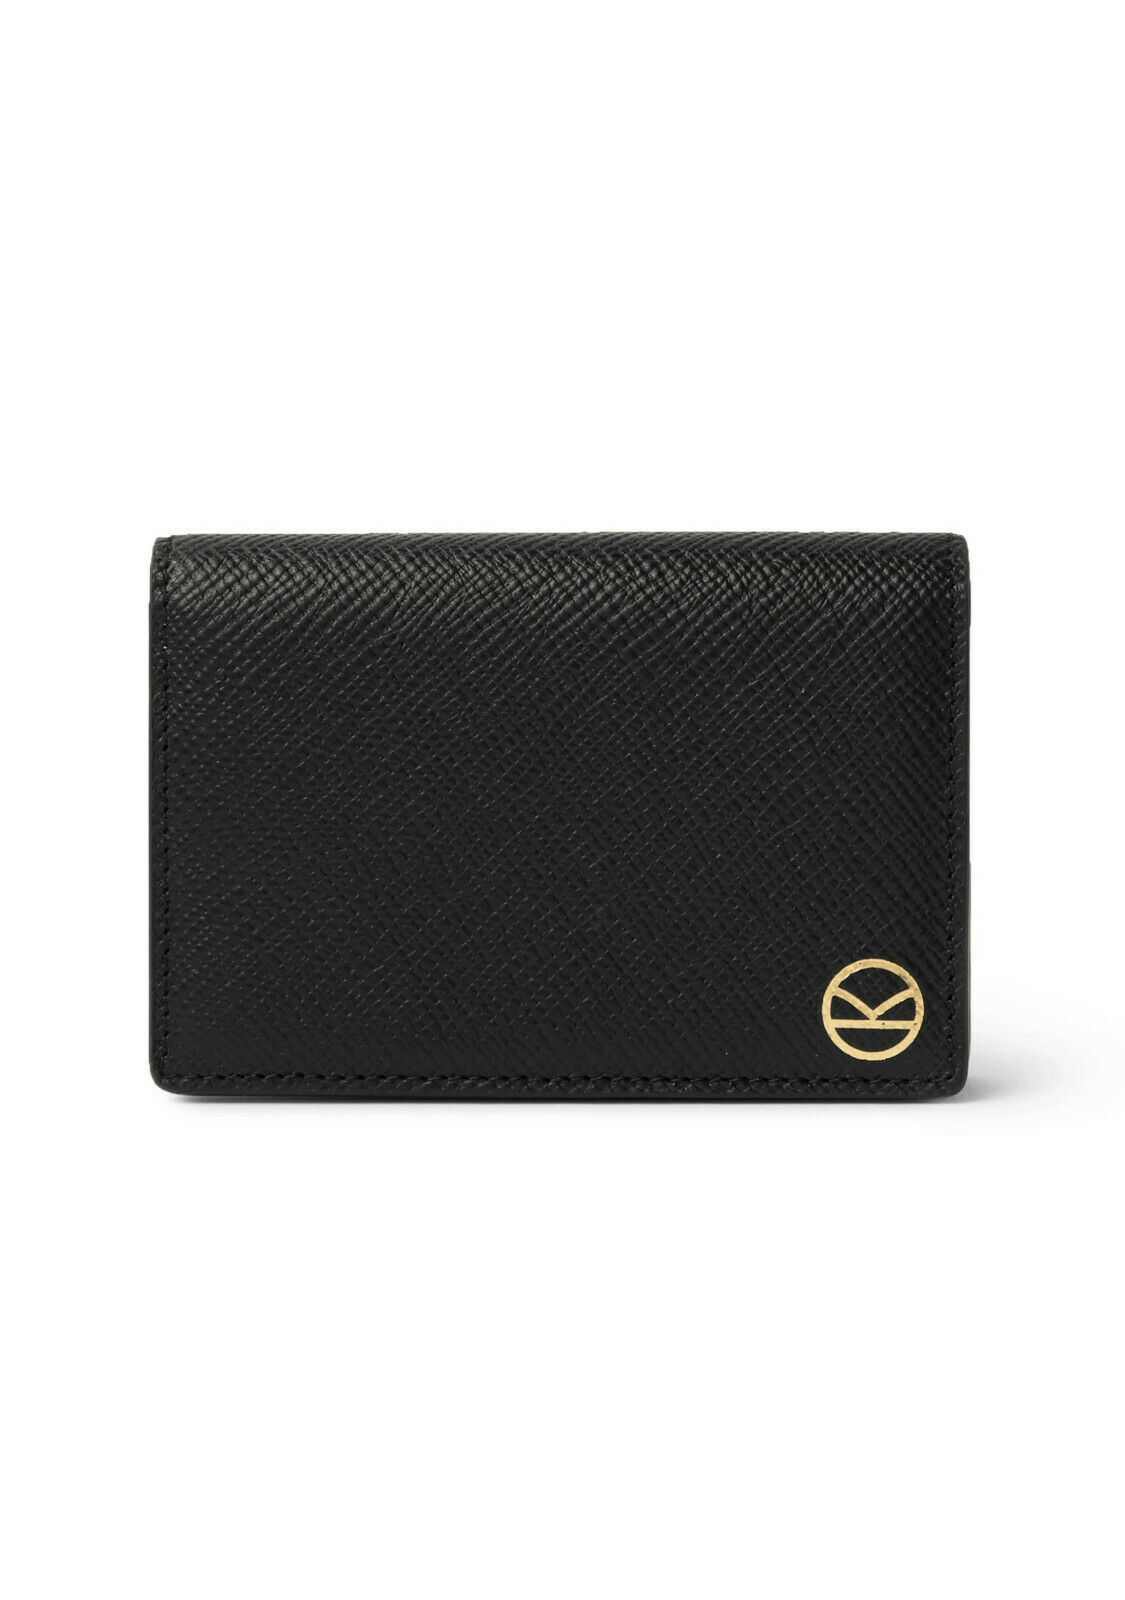 Kingsman x Smythson Panama Cardholder Black Calf Leather - Brand new, RRP